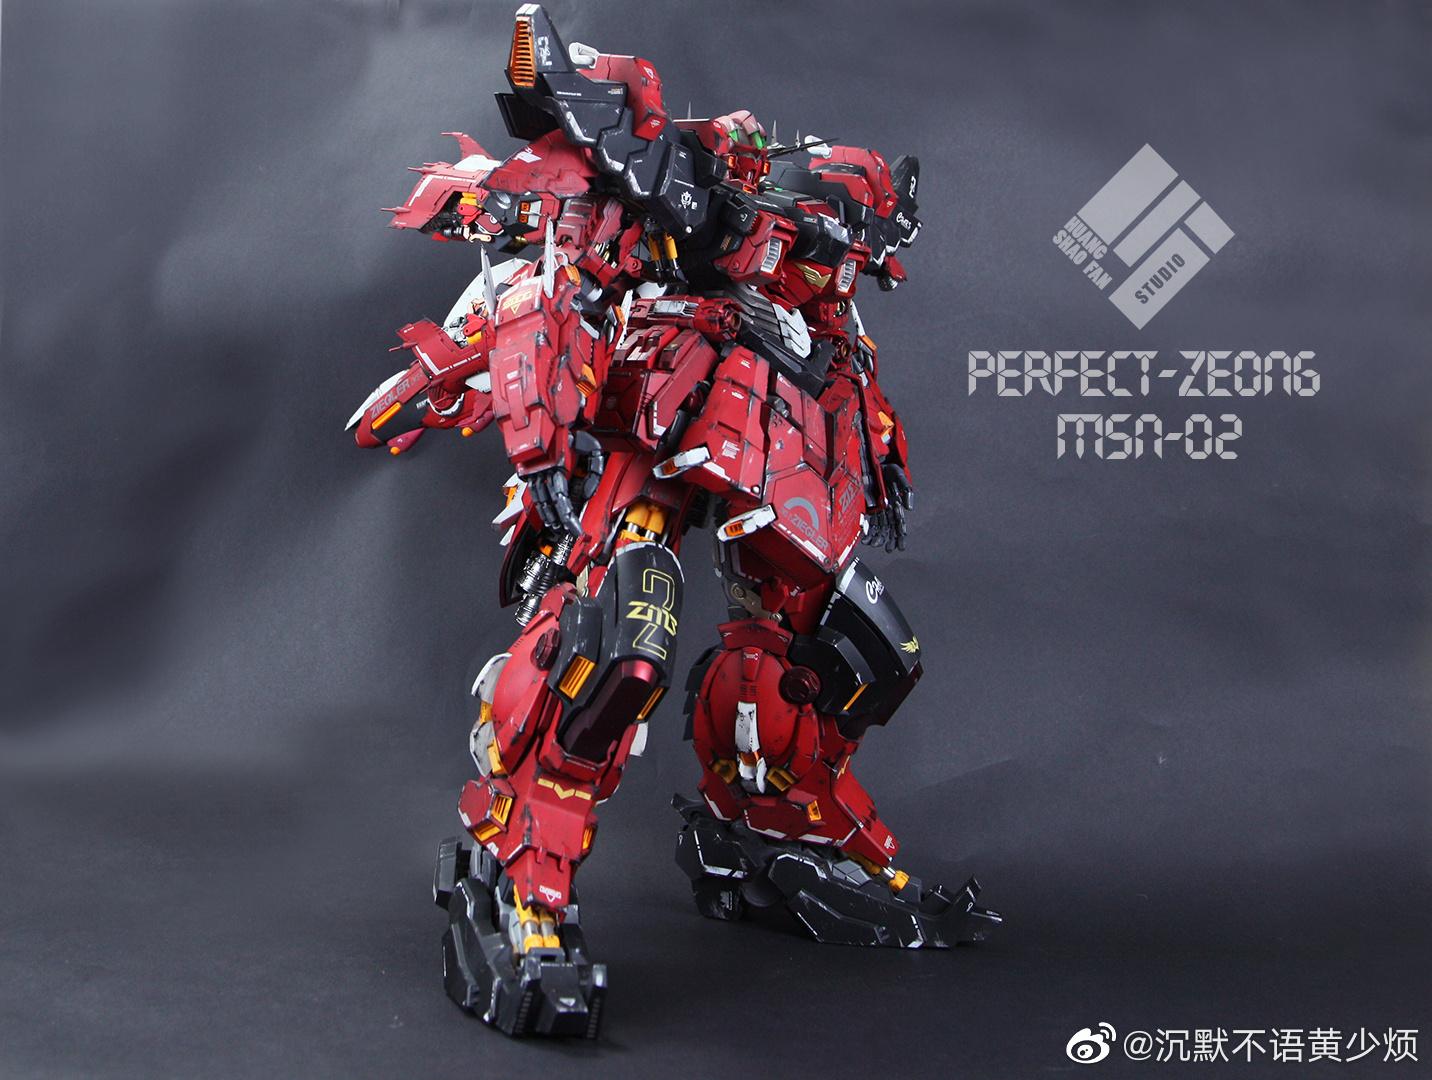 S164_2_mc_perfect_zeong_red_003.jpg